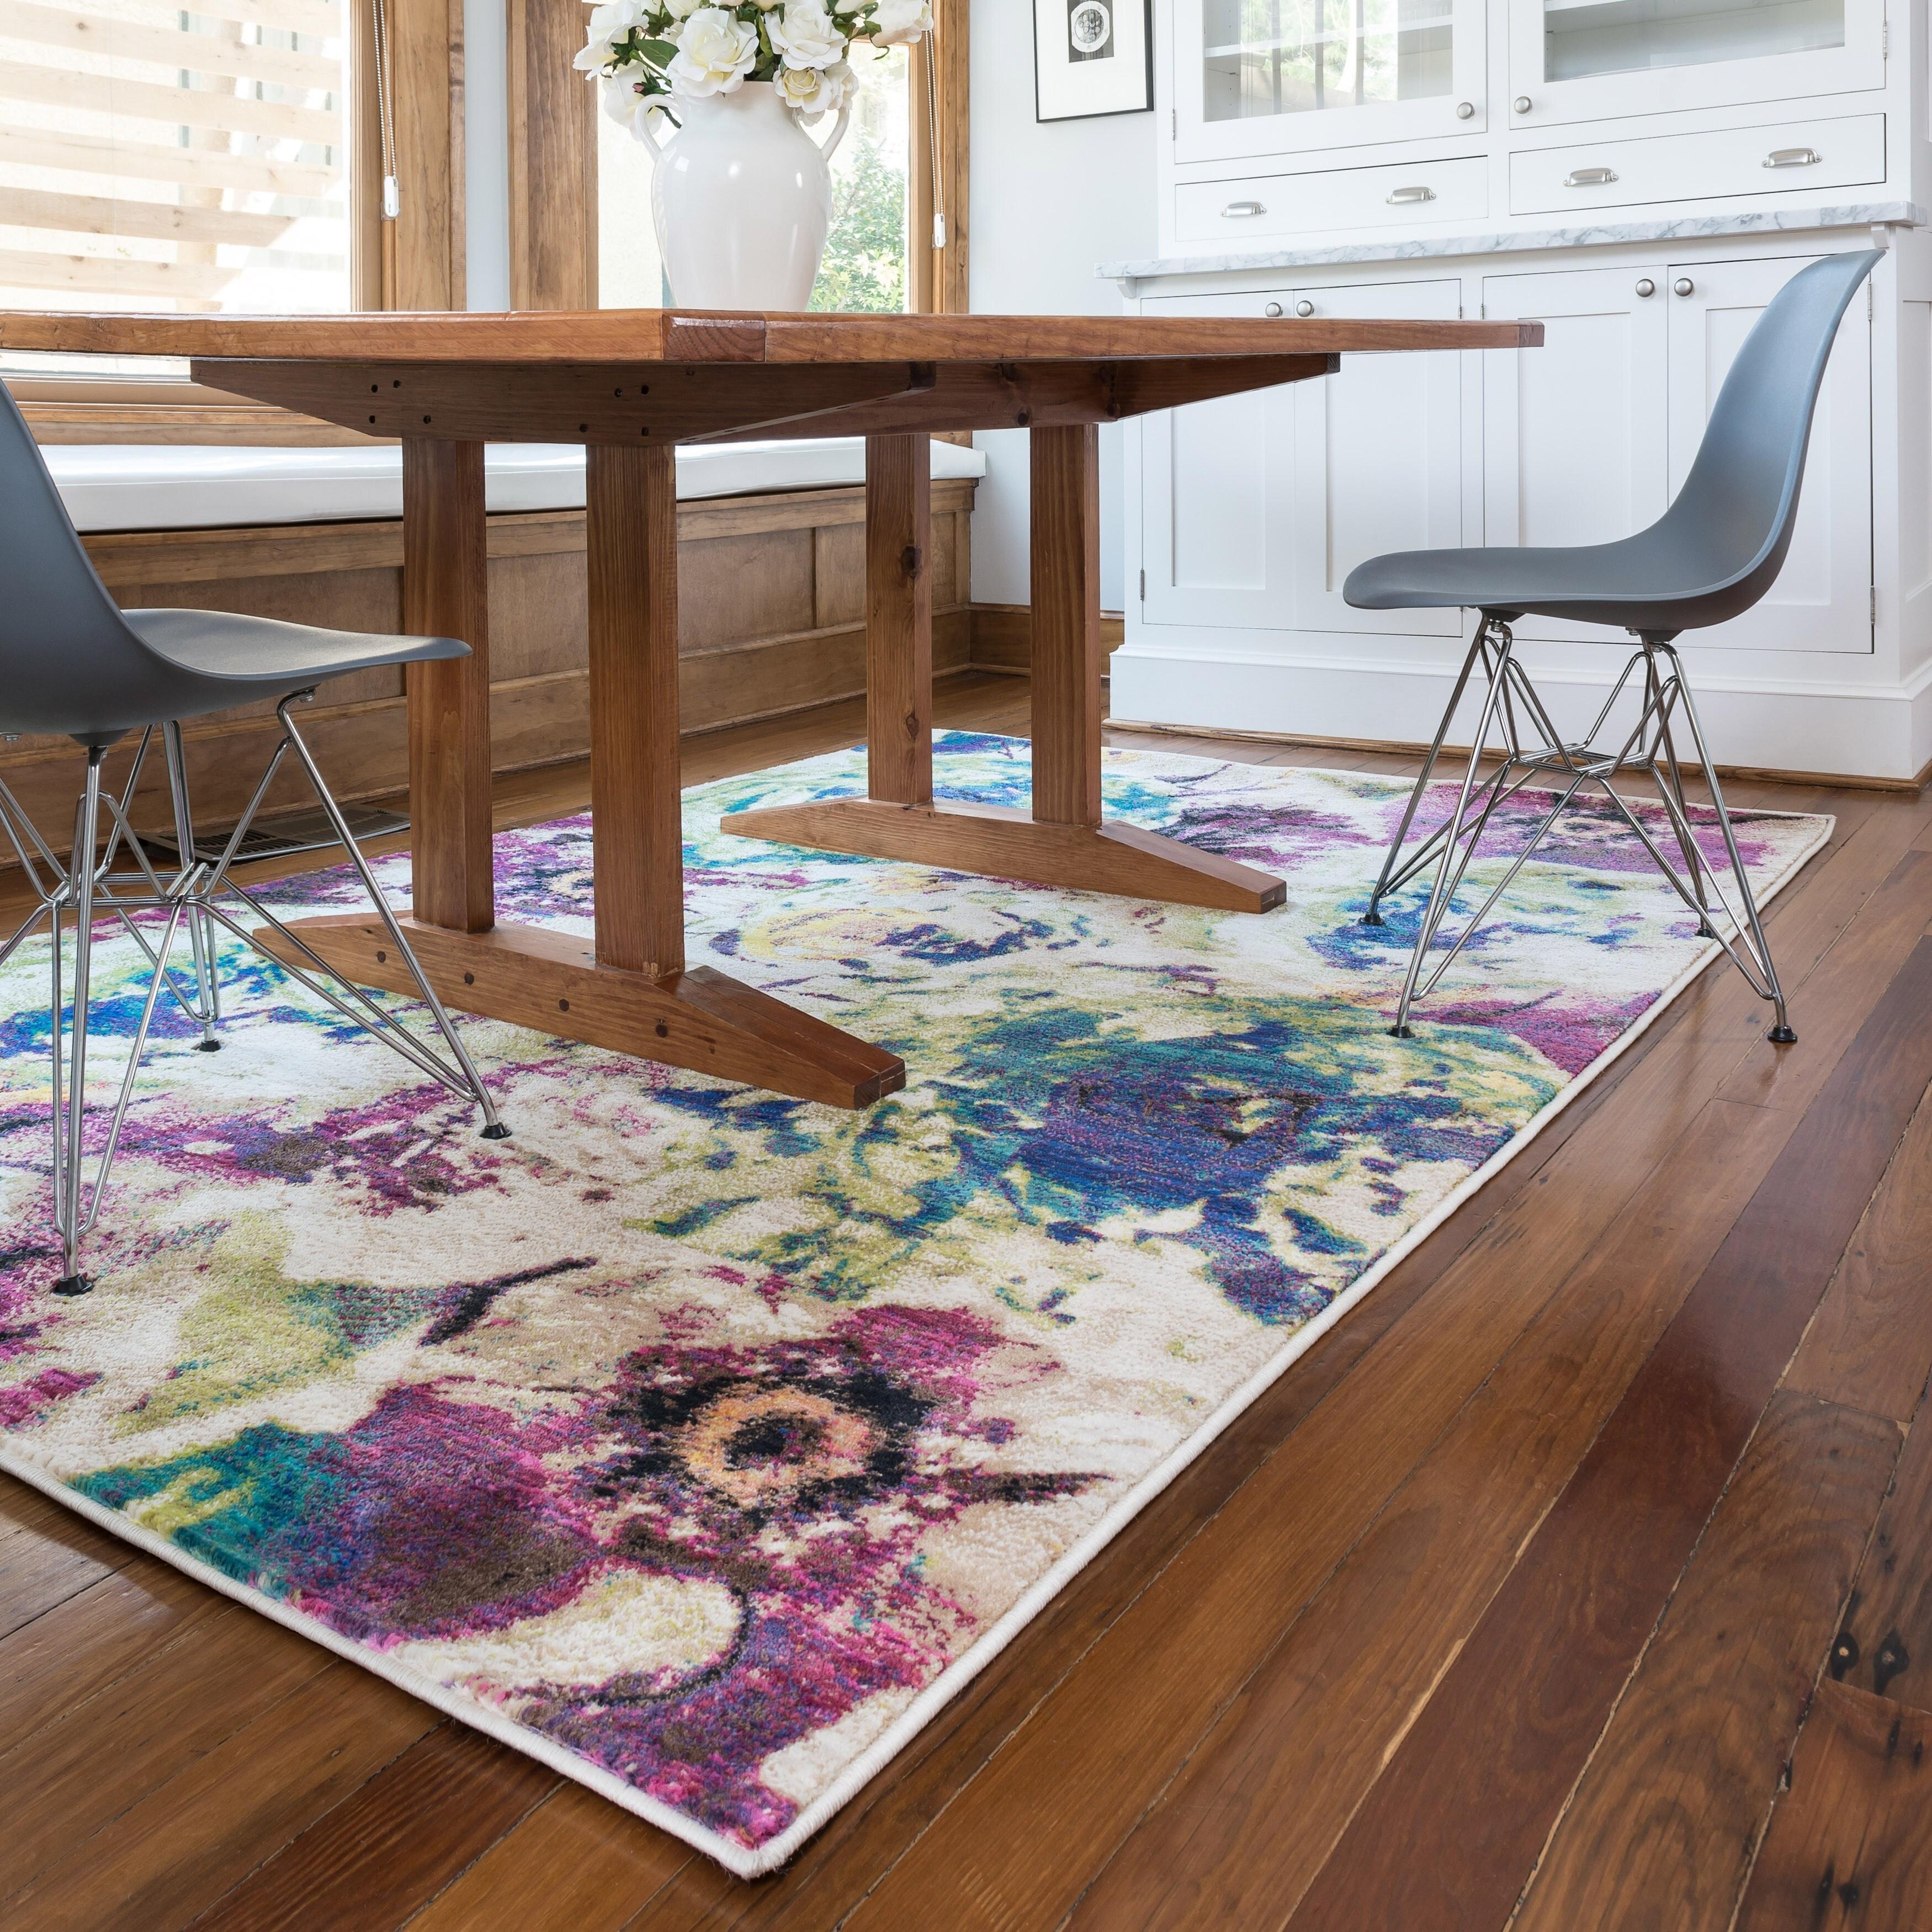 Alexander Home Skye Monet Magenta/ Multi Rug (5'2 x 7'7) ...